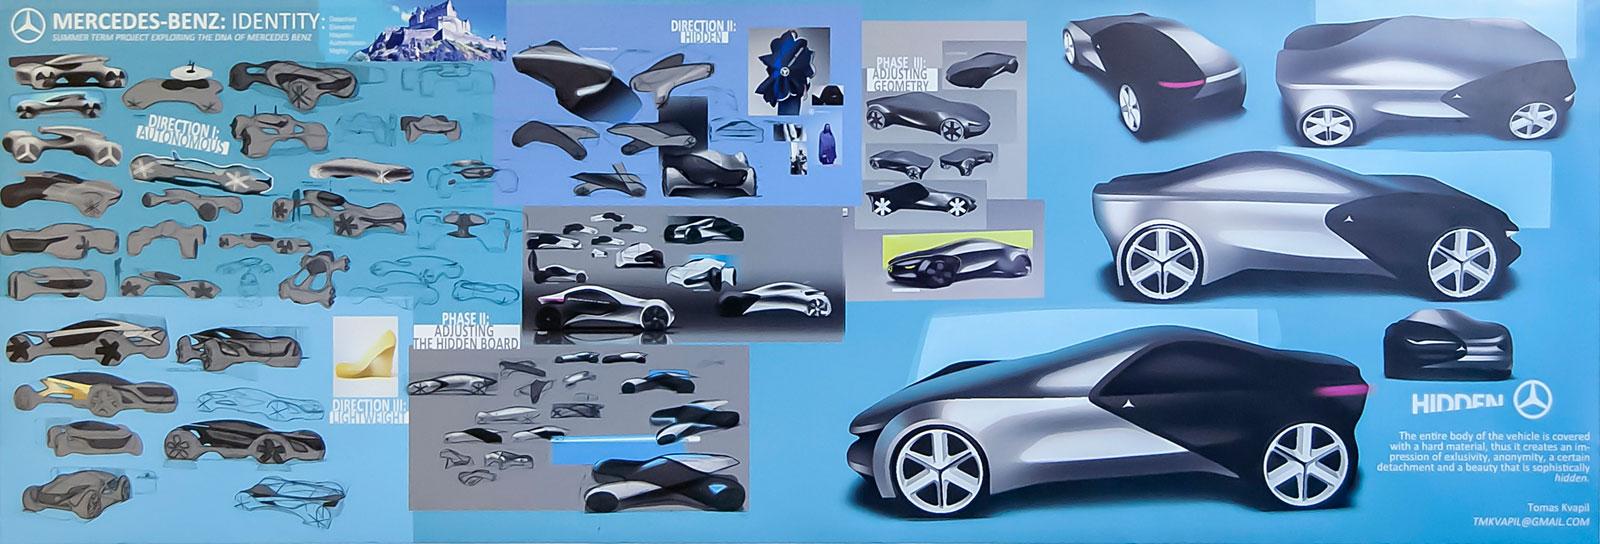 Land Rover  Kahn Design Packages  Alloy Wheels  Car